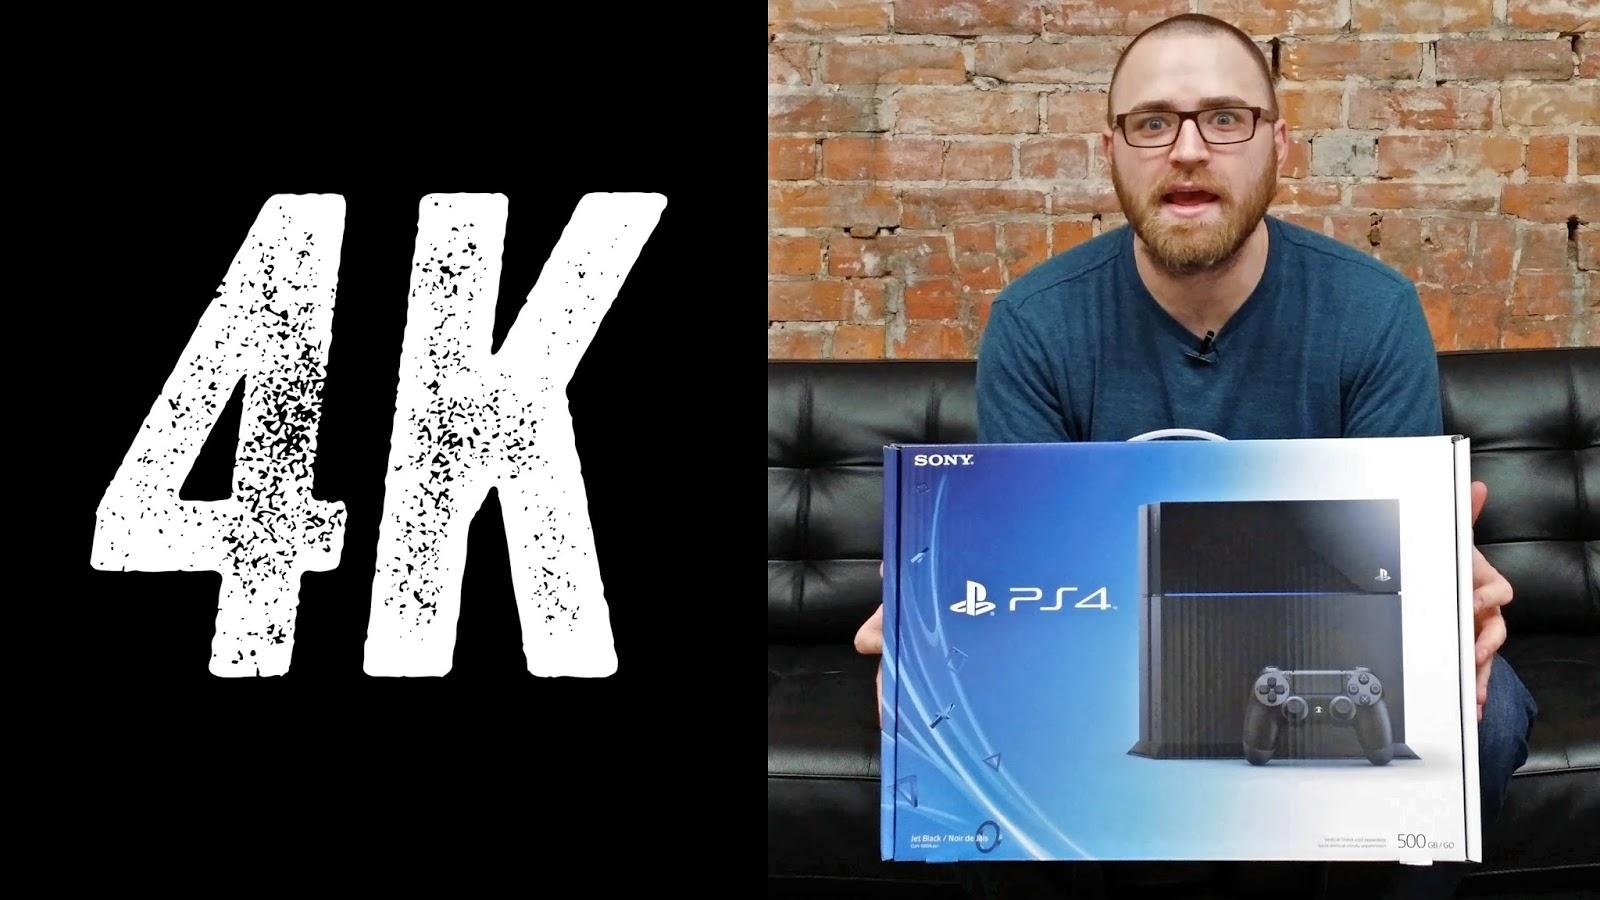 Sony rumors: PlayStation 4 in 4K resolution